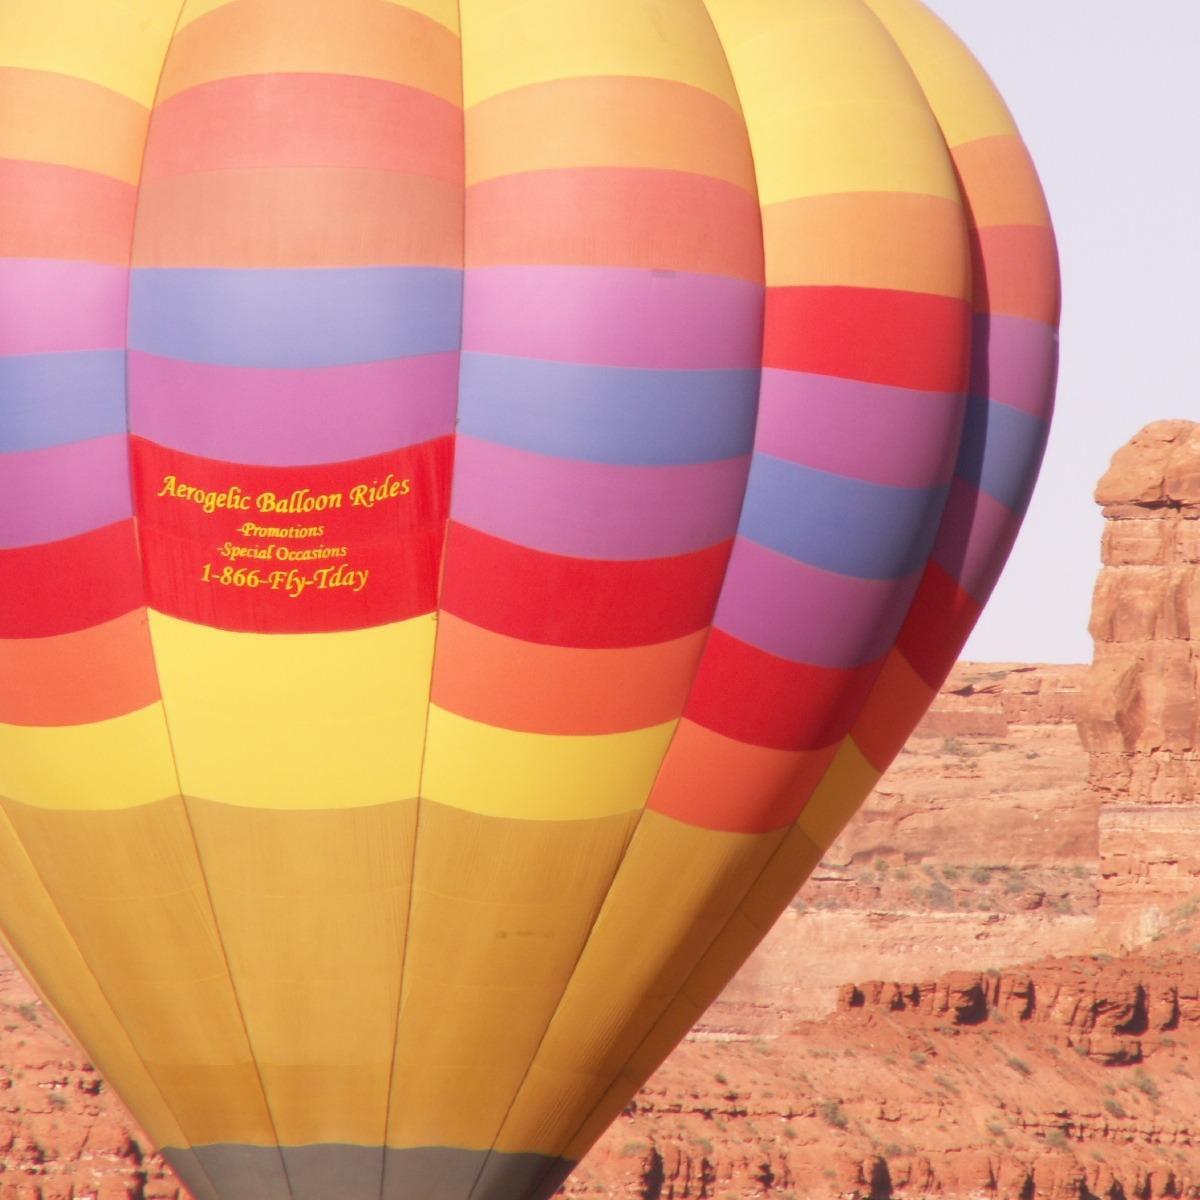 Phoenix Hot Air Balloon Rides- Aerogelic Ballooning - Phoenix, AZ 85027 - (602)402-8041 | ShowMeLocal.com